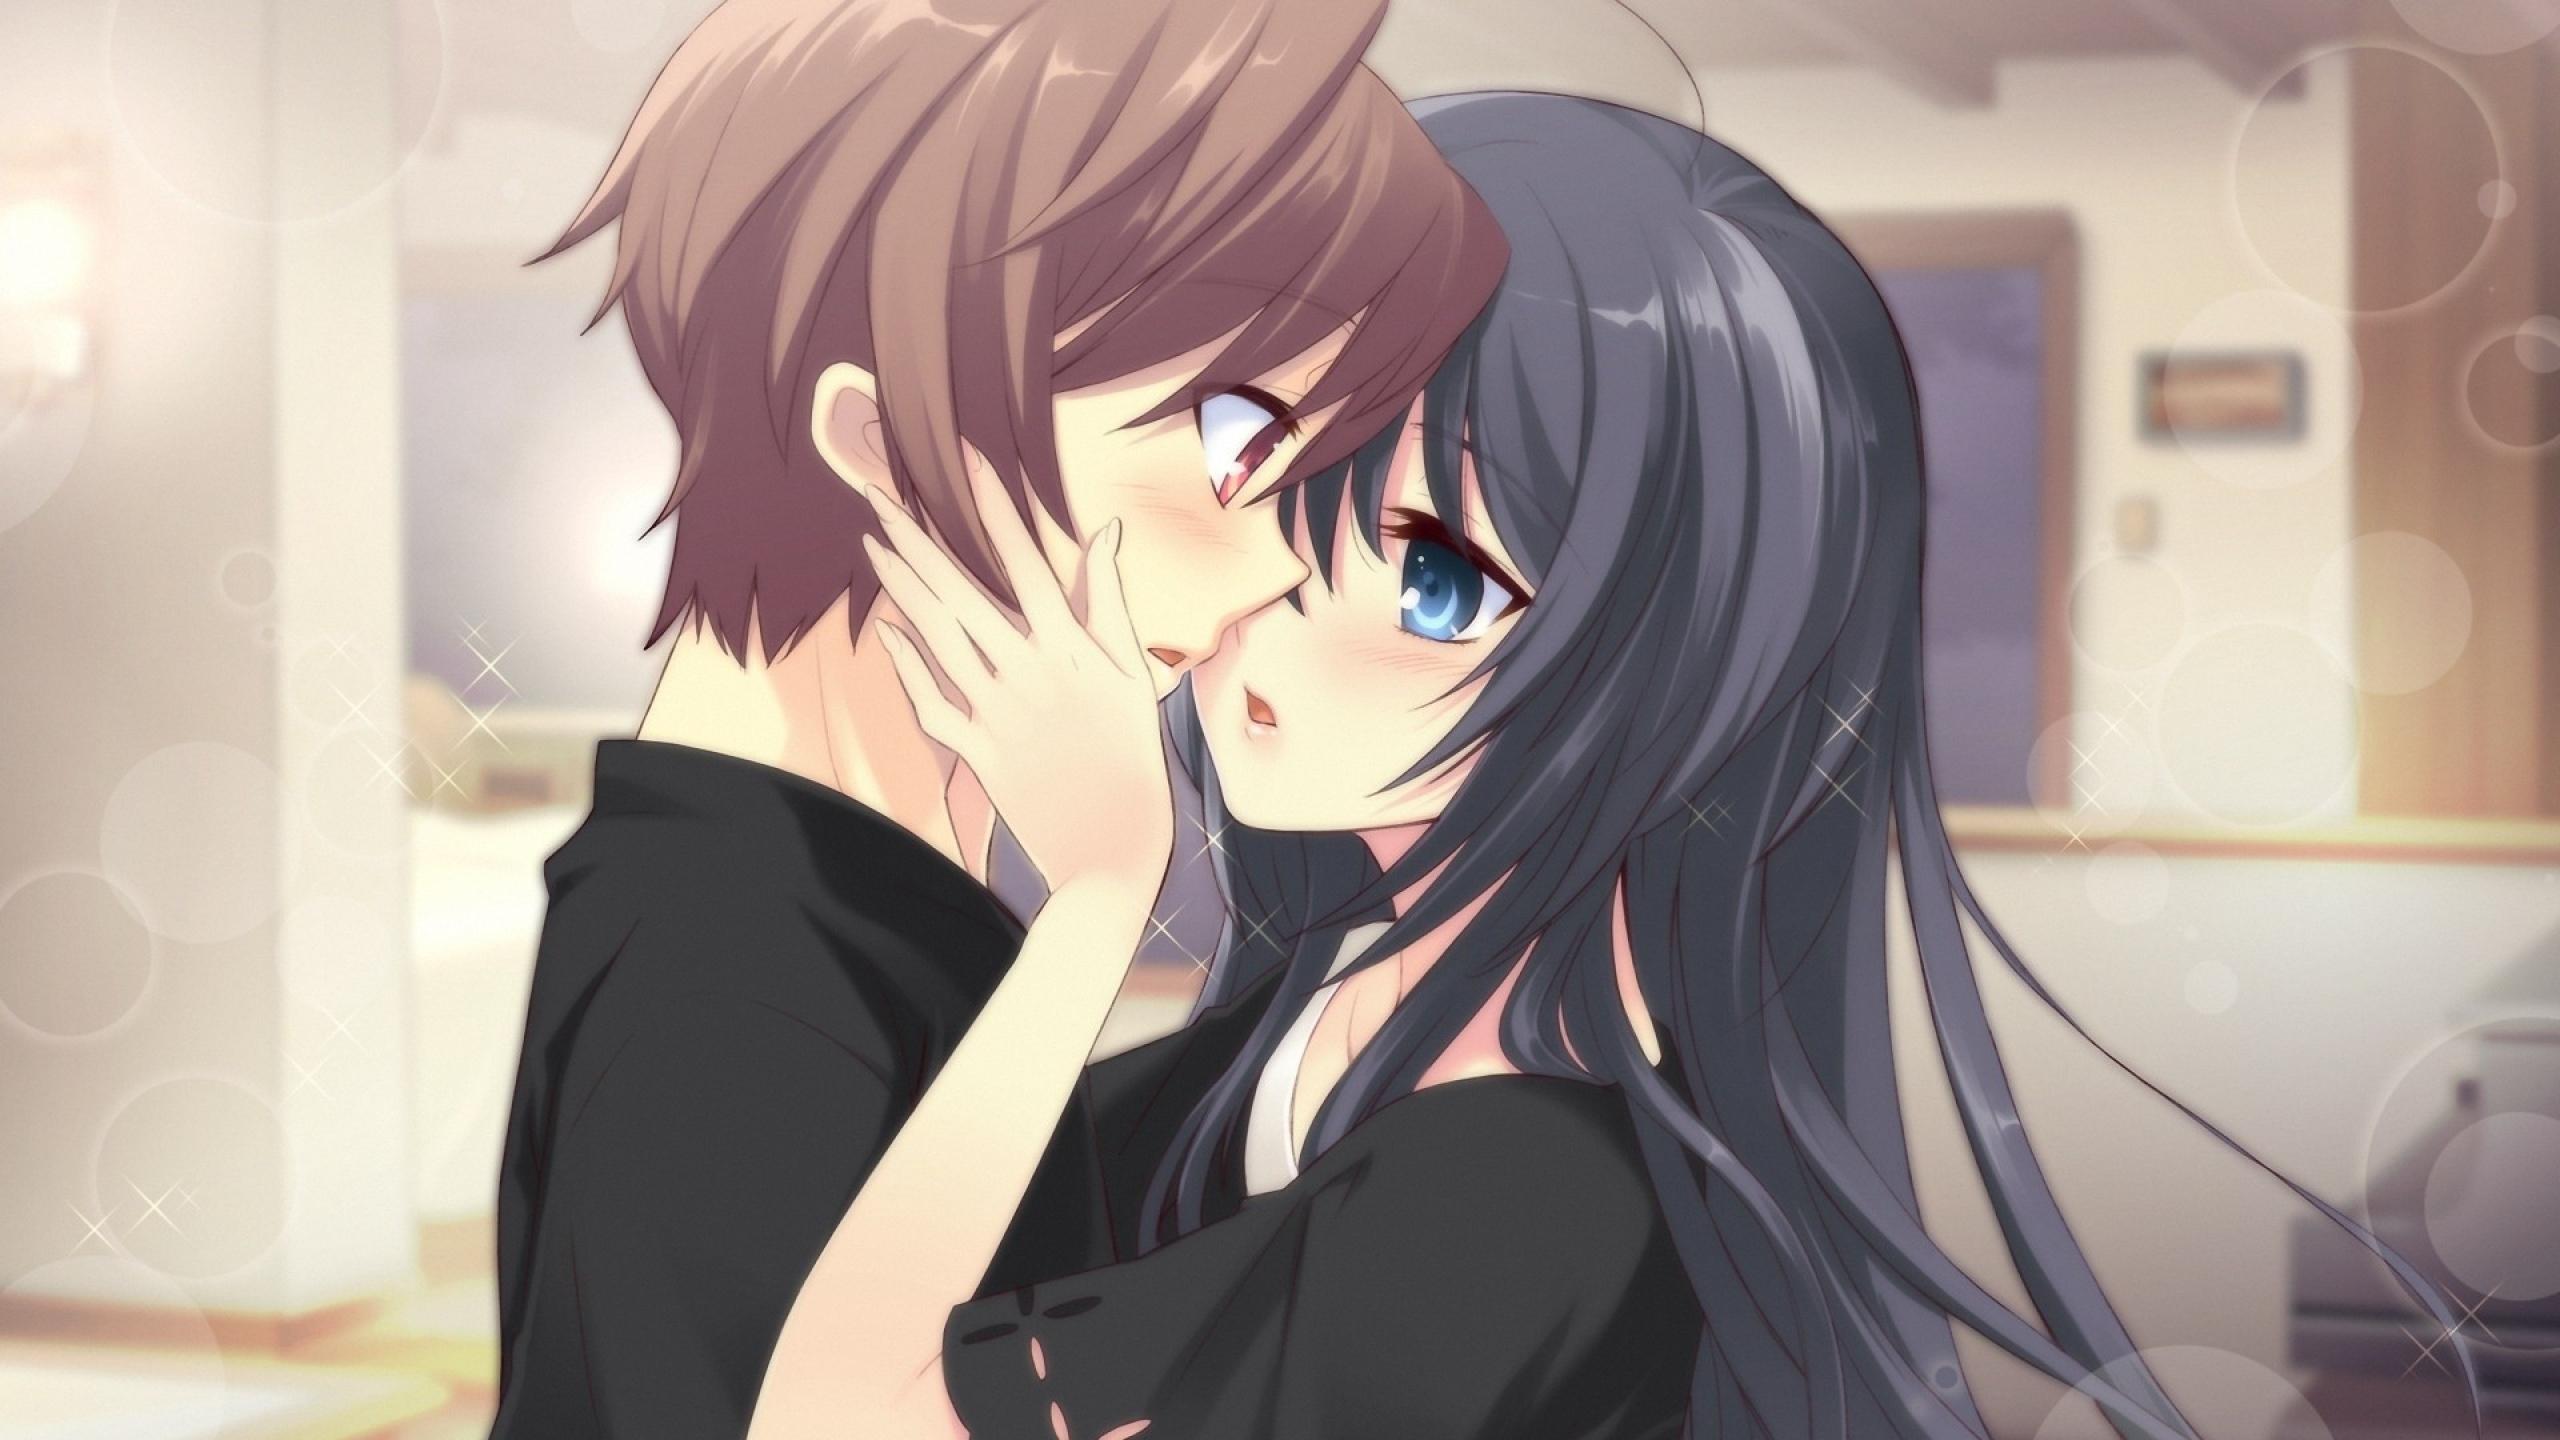 Anime Love Wallpaper Hd For Desktop Mobile Wallpapers 2560x1440